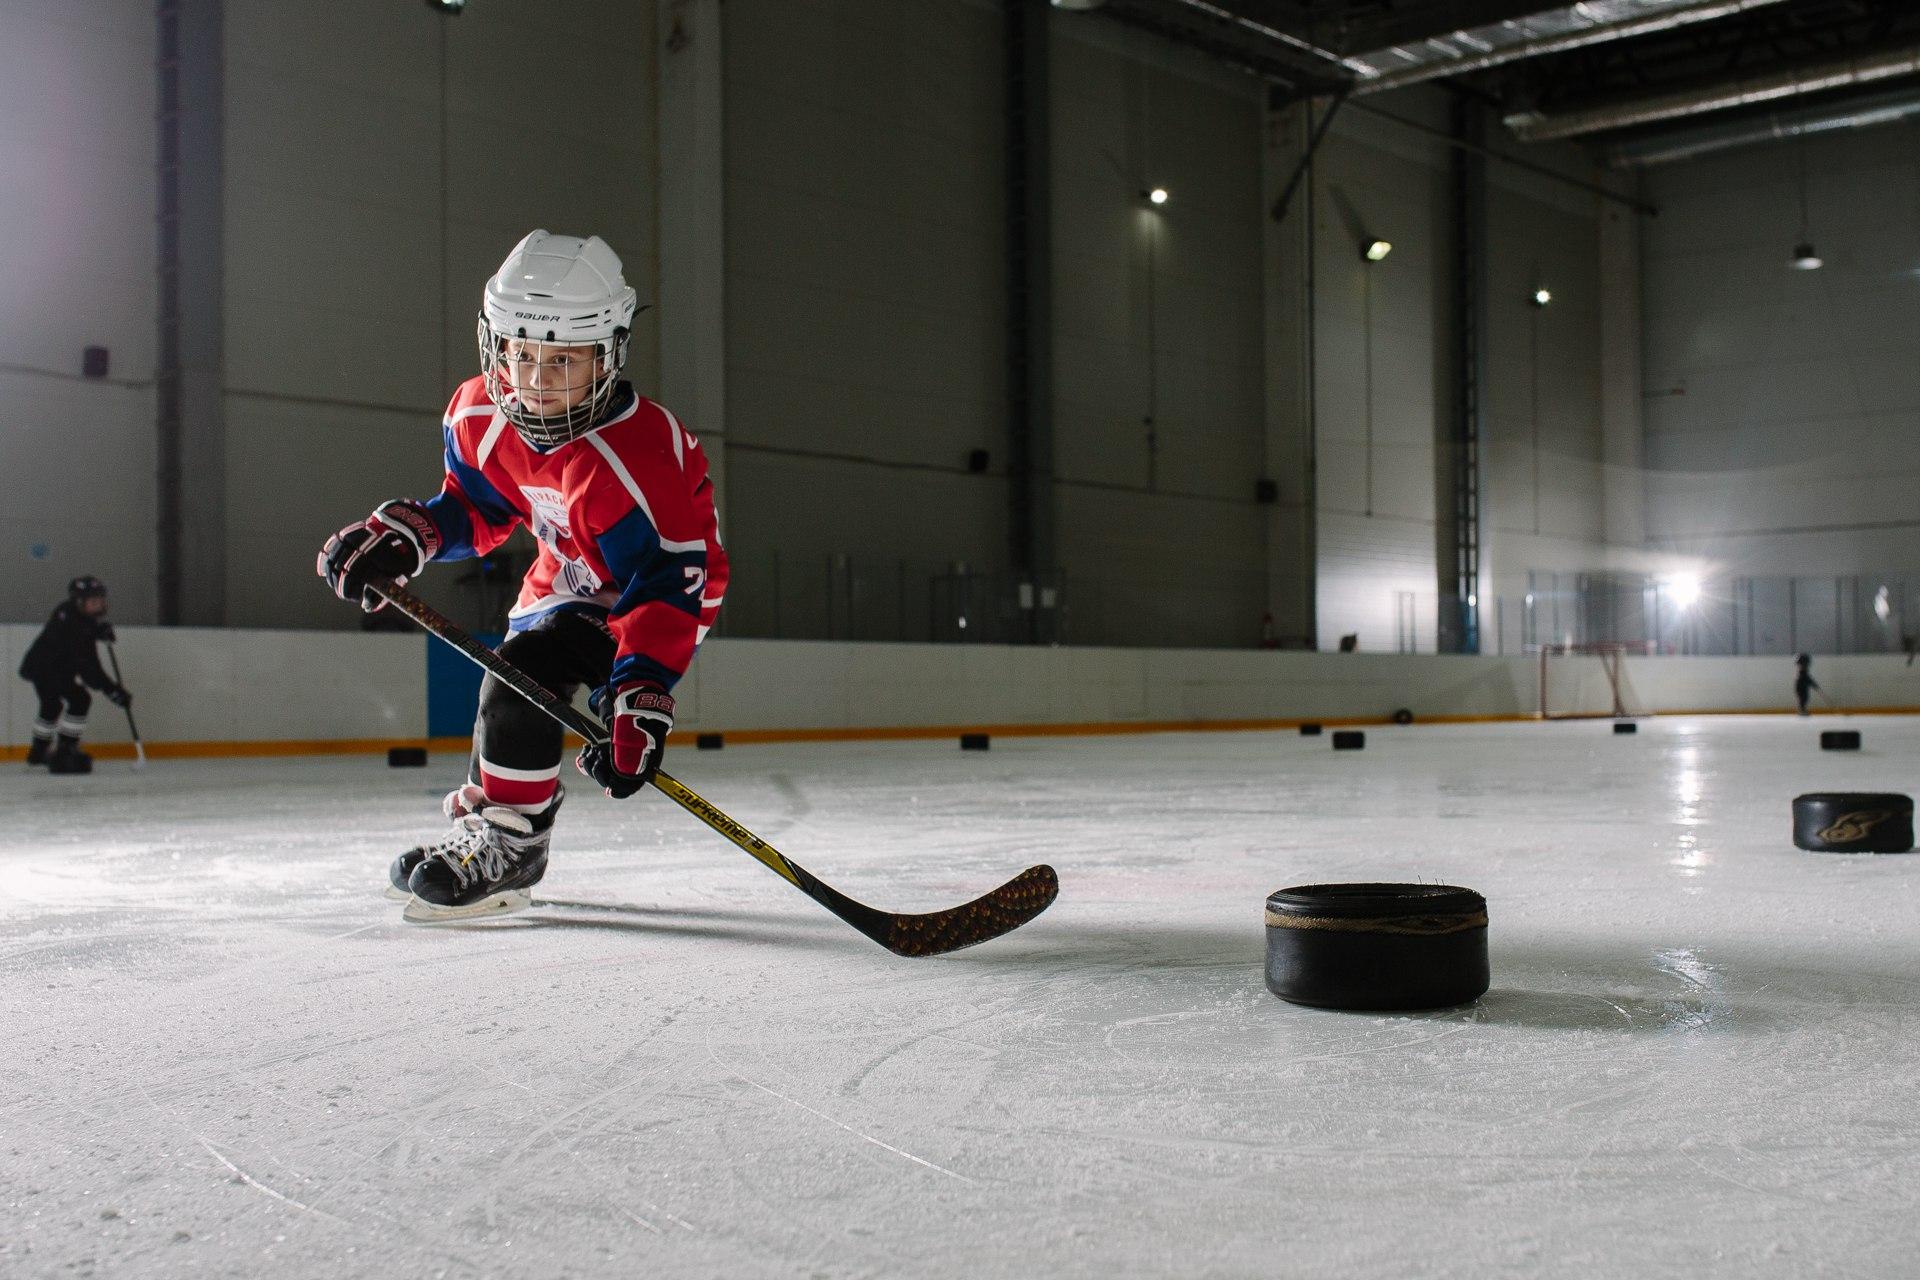 Хоккей 6 октября спб [PUNIQRANDLINE-(au-dating-names.txt) 28